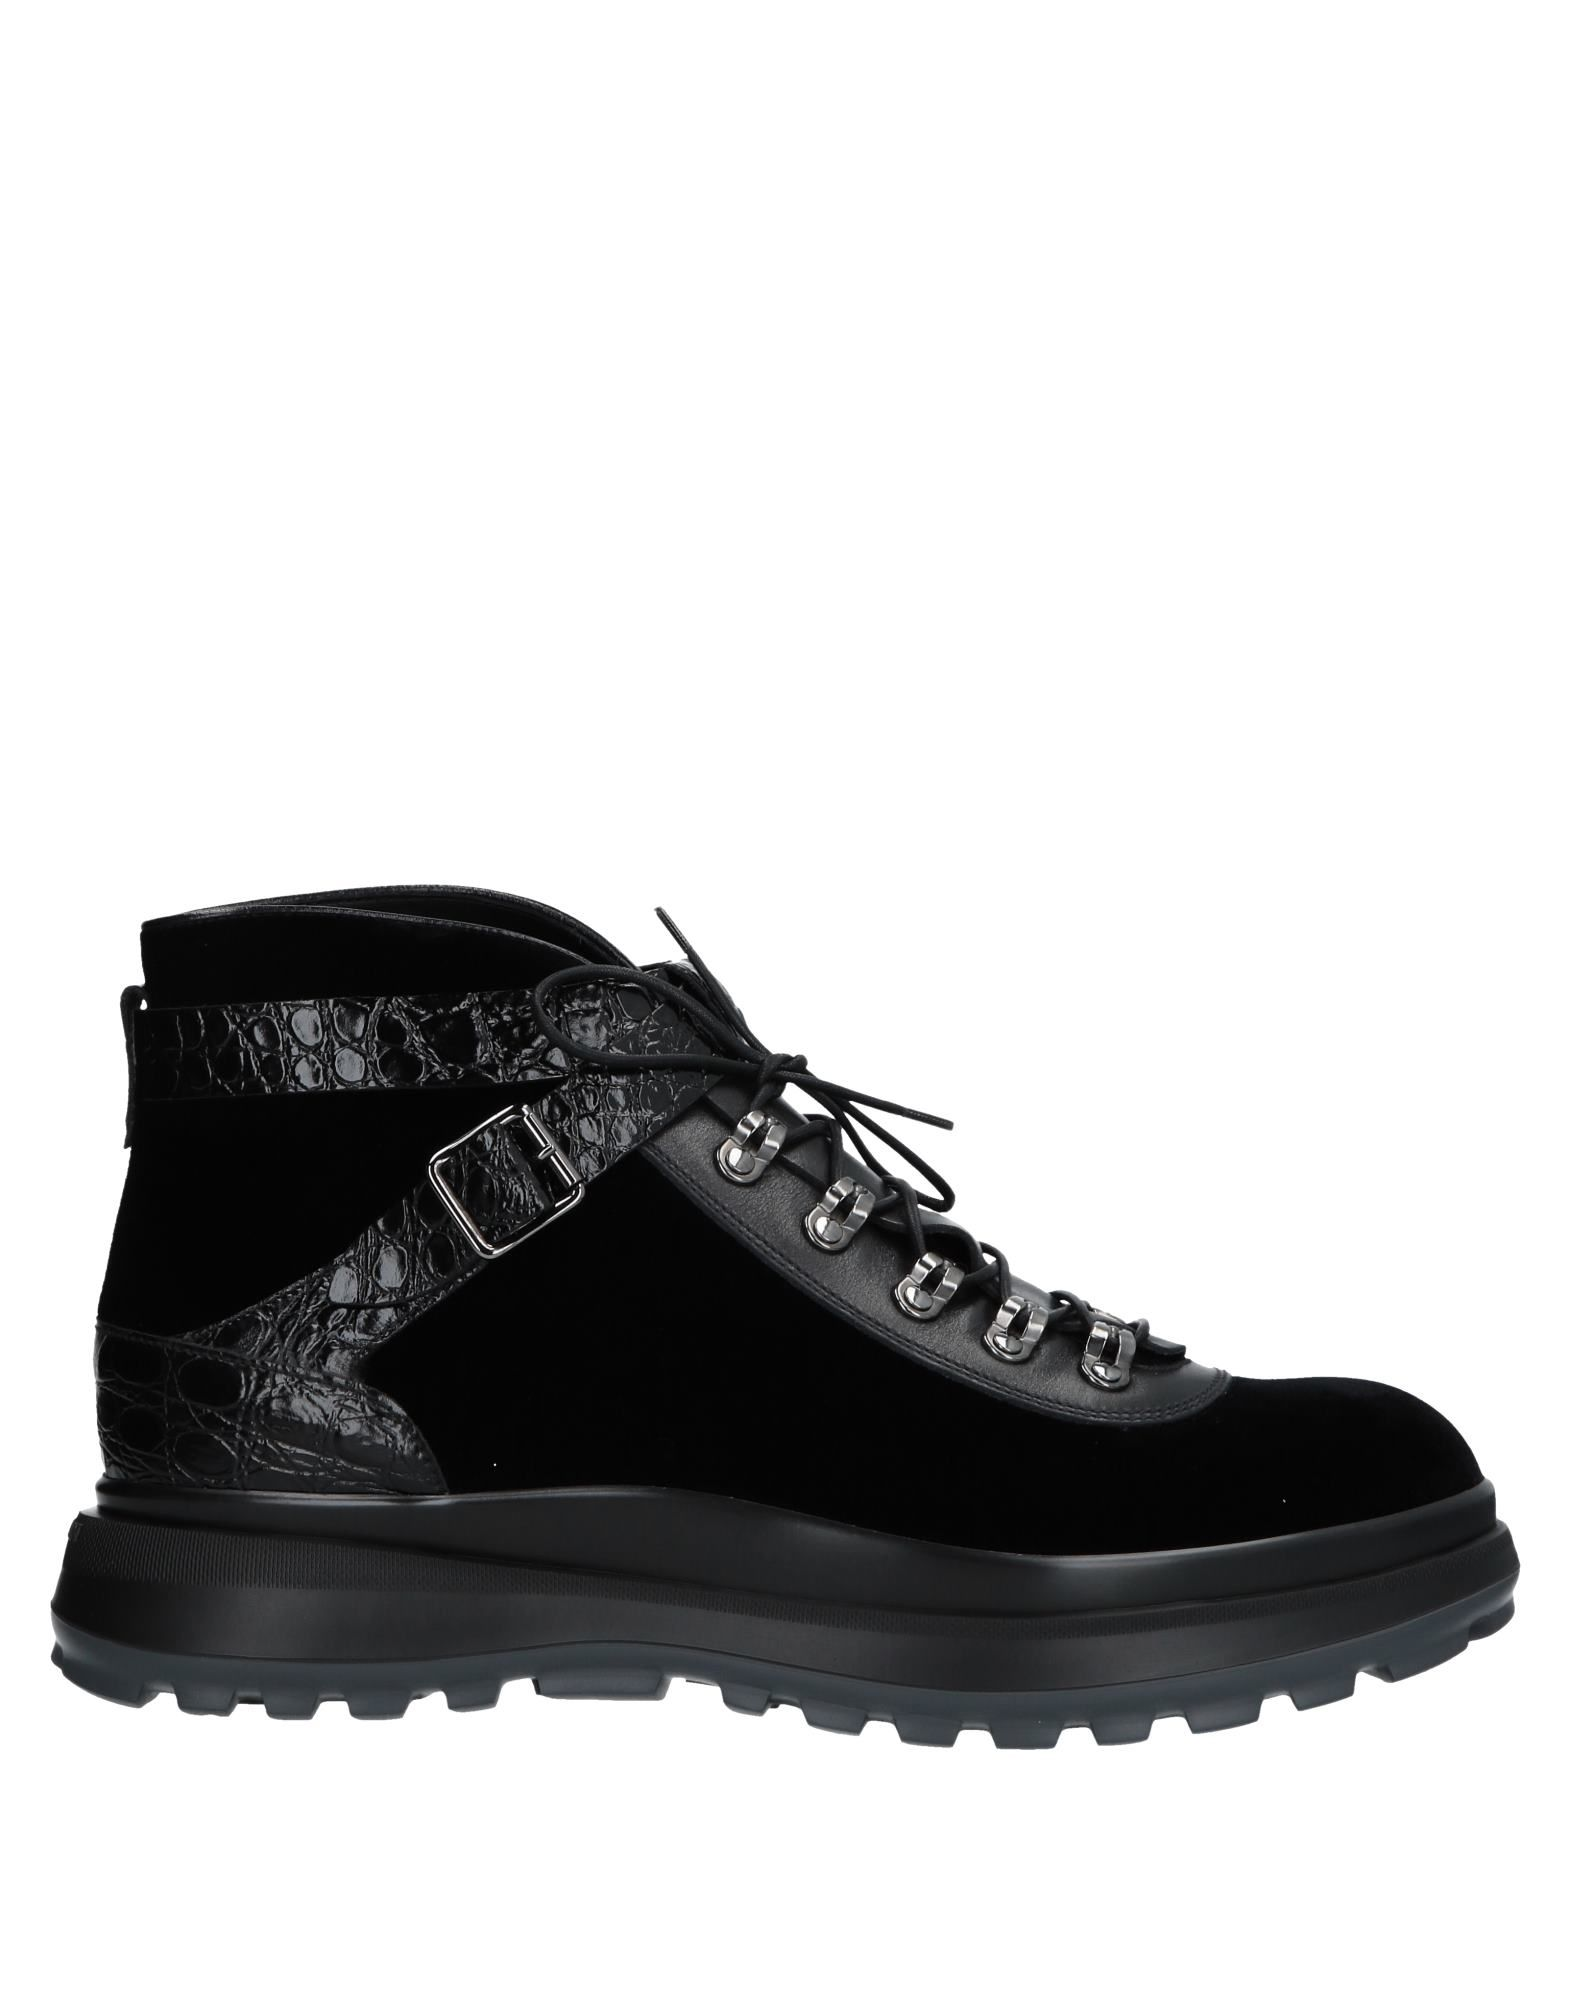 newest collection 01849 1dfbb Sneakers Giorgio Armani Homme - Sneakers Giorgio Armani Noir Dédouanement  saisonnier